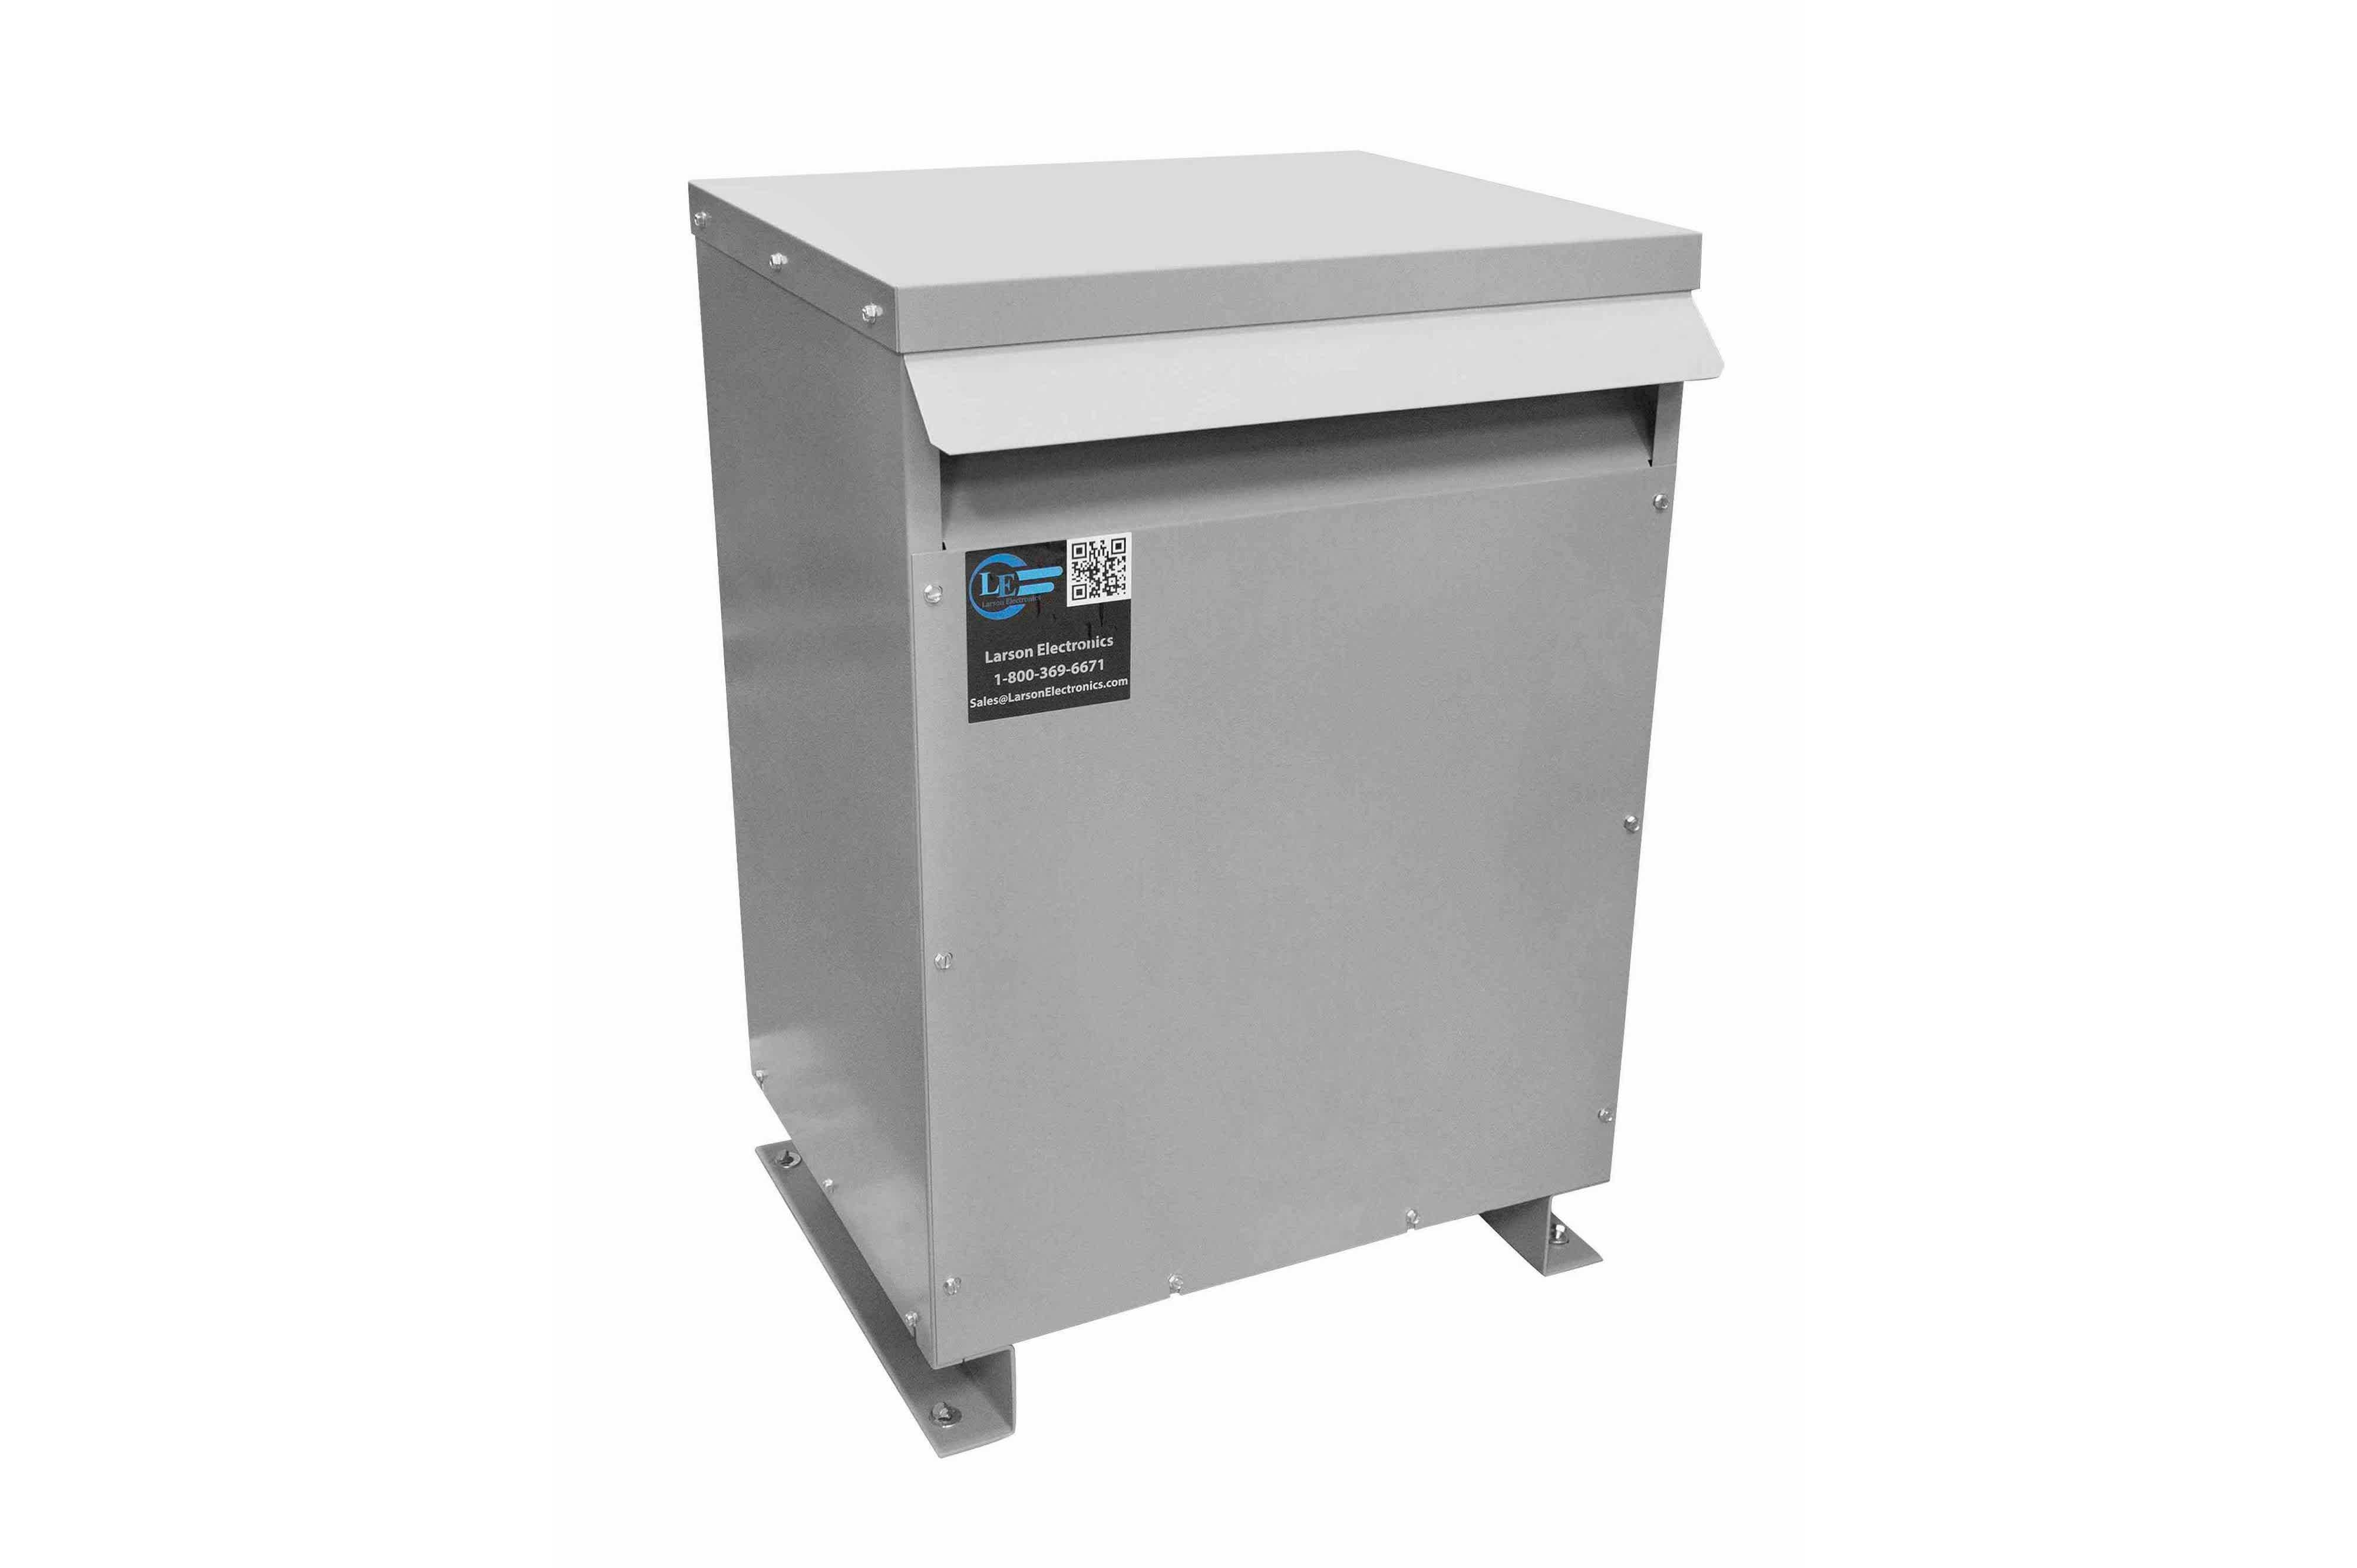 150 kVA 3PH Isolation Transformer, 575V Wye Primary, 400Y/231 Wye-N Secondary, N3R, Ventilated, 60 Hz